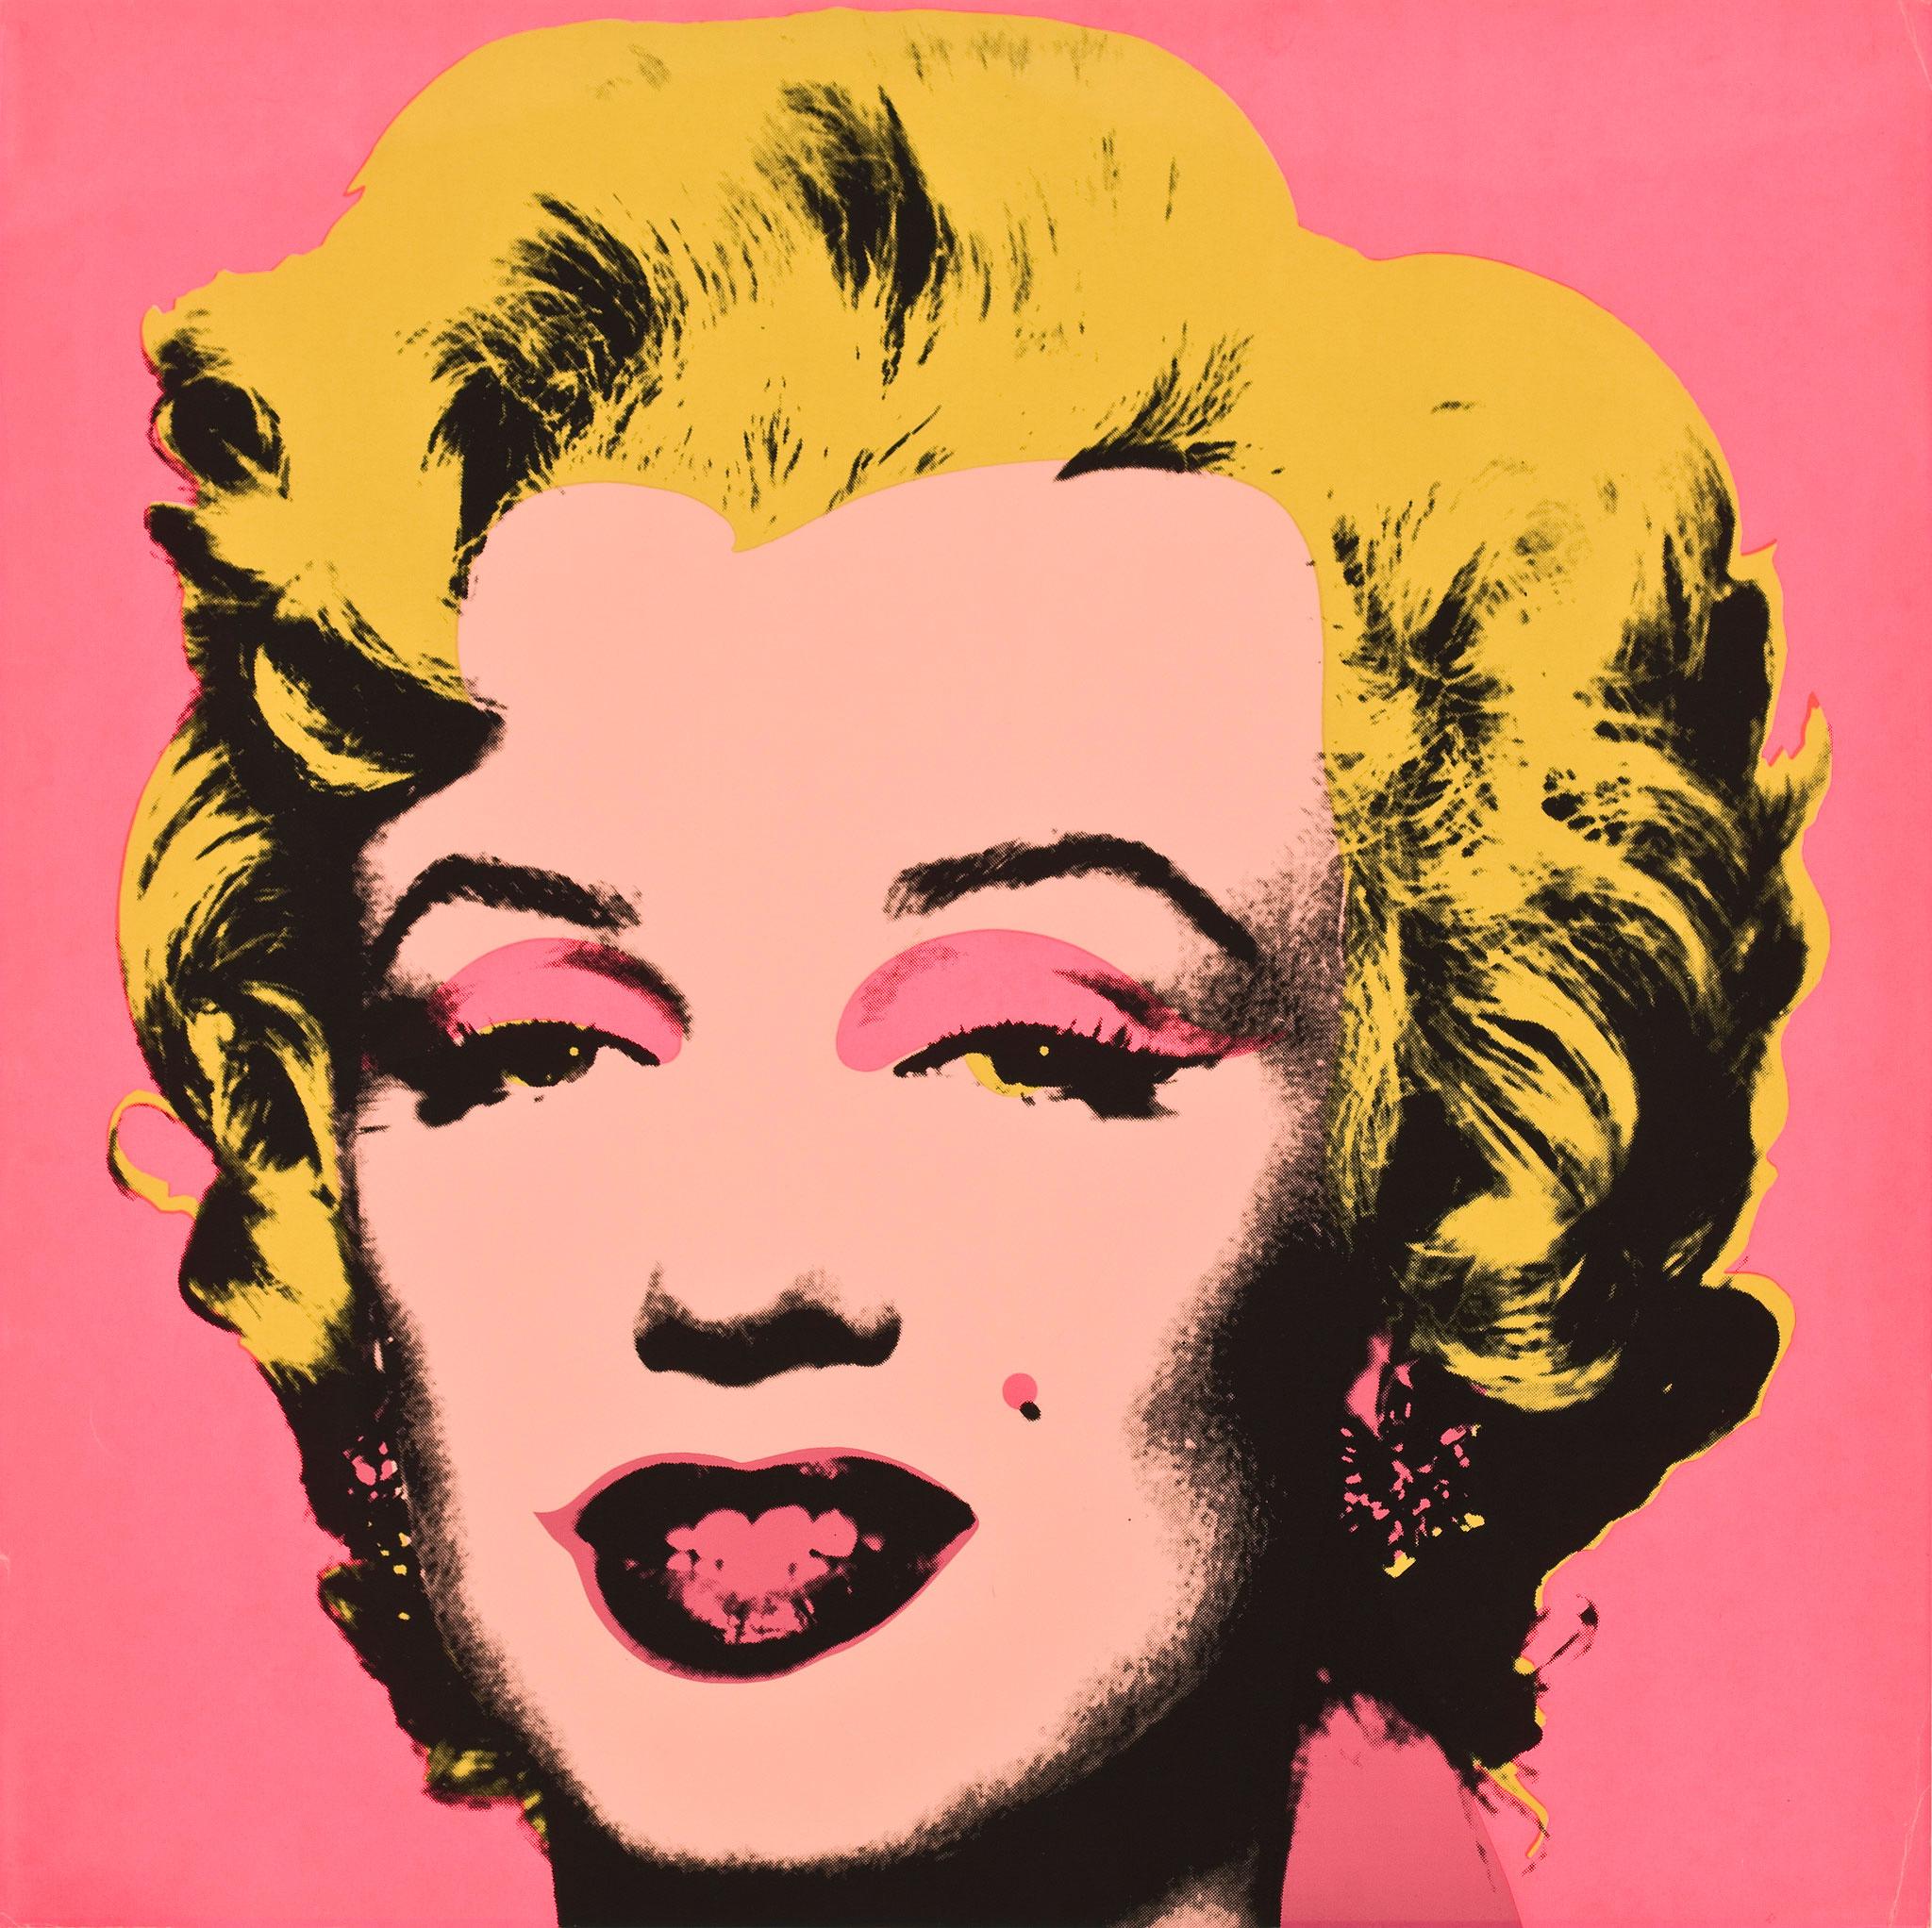 Andy Warhol, Marilyn (Marilyn Monroe), 1967, screenprint on paper, 36 x 36 inches.